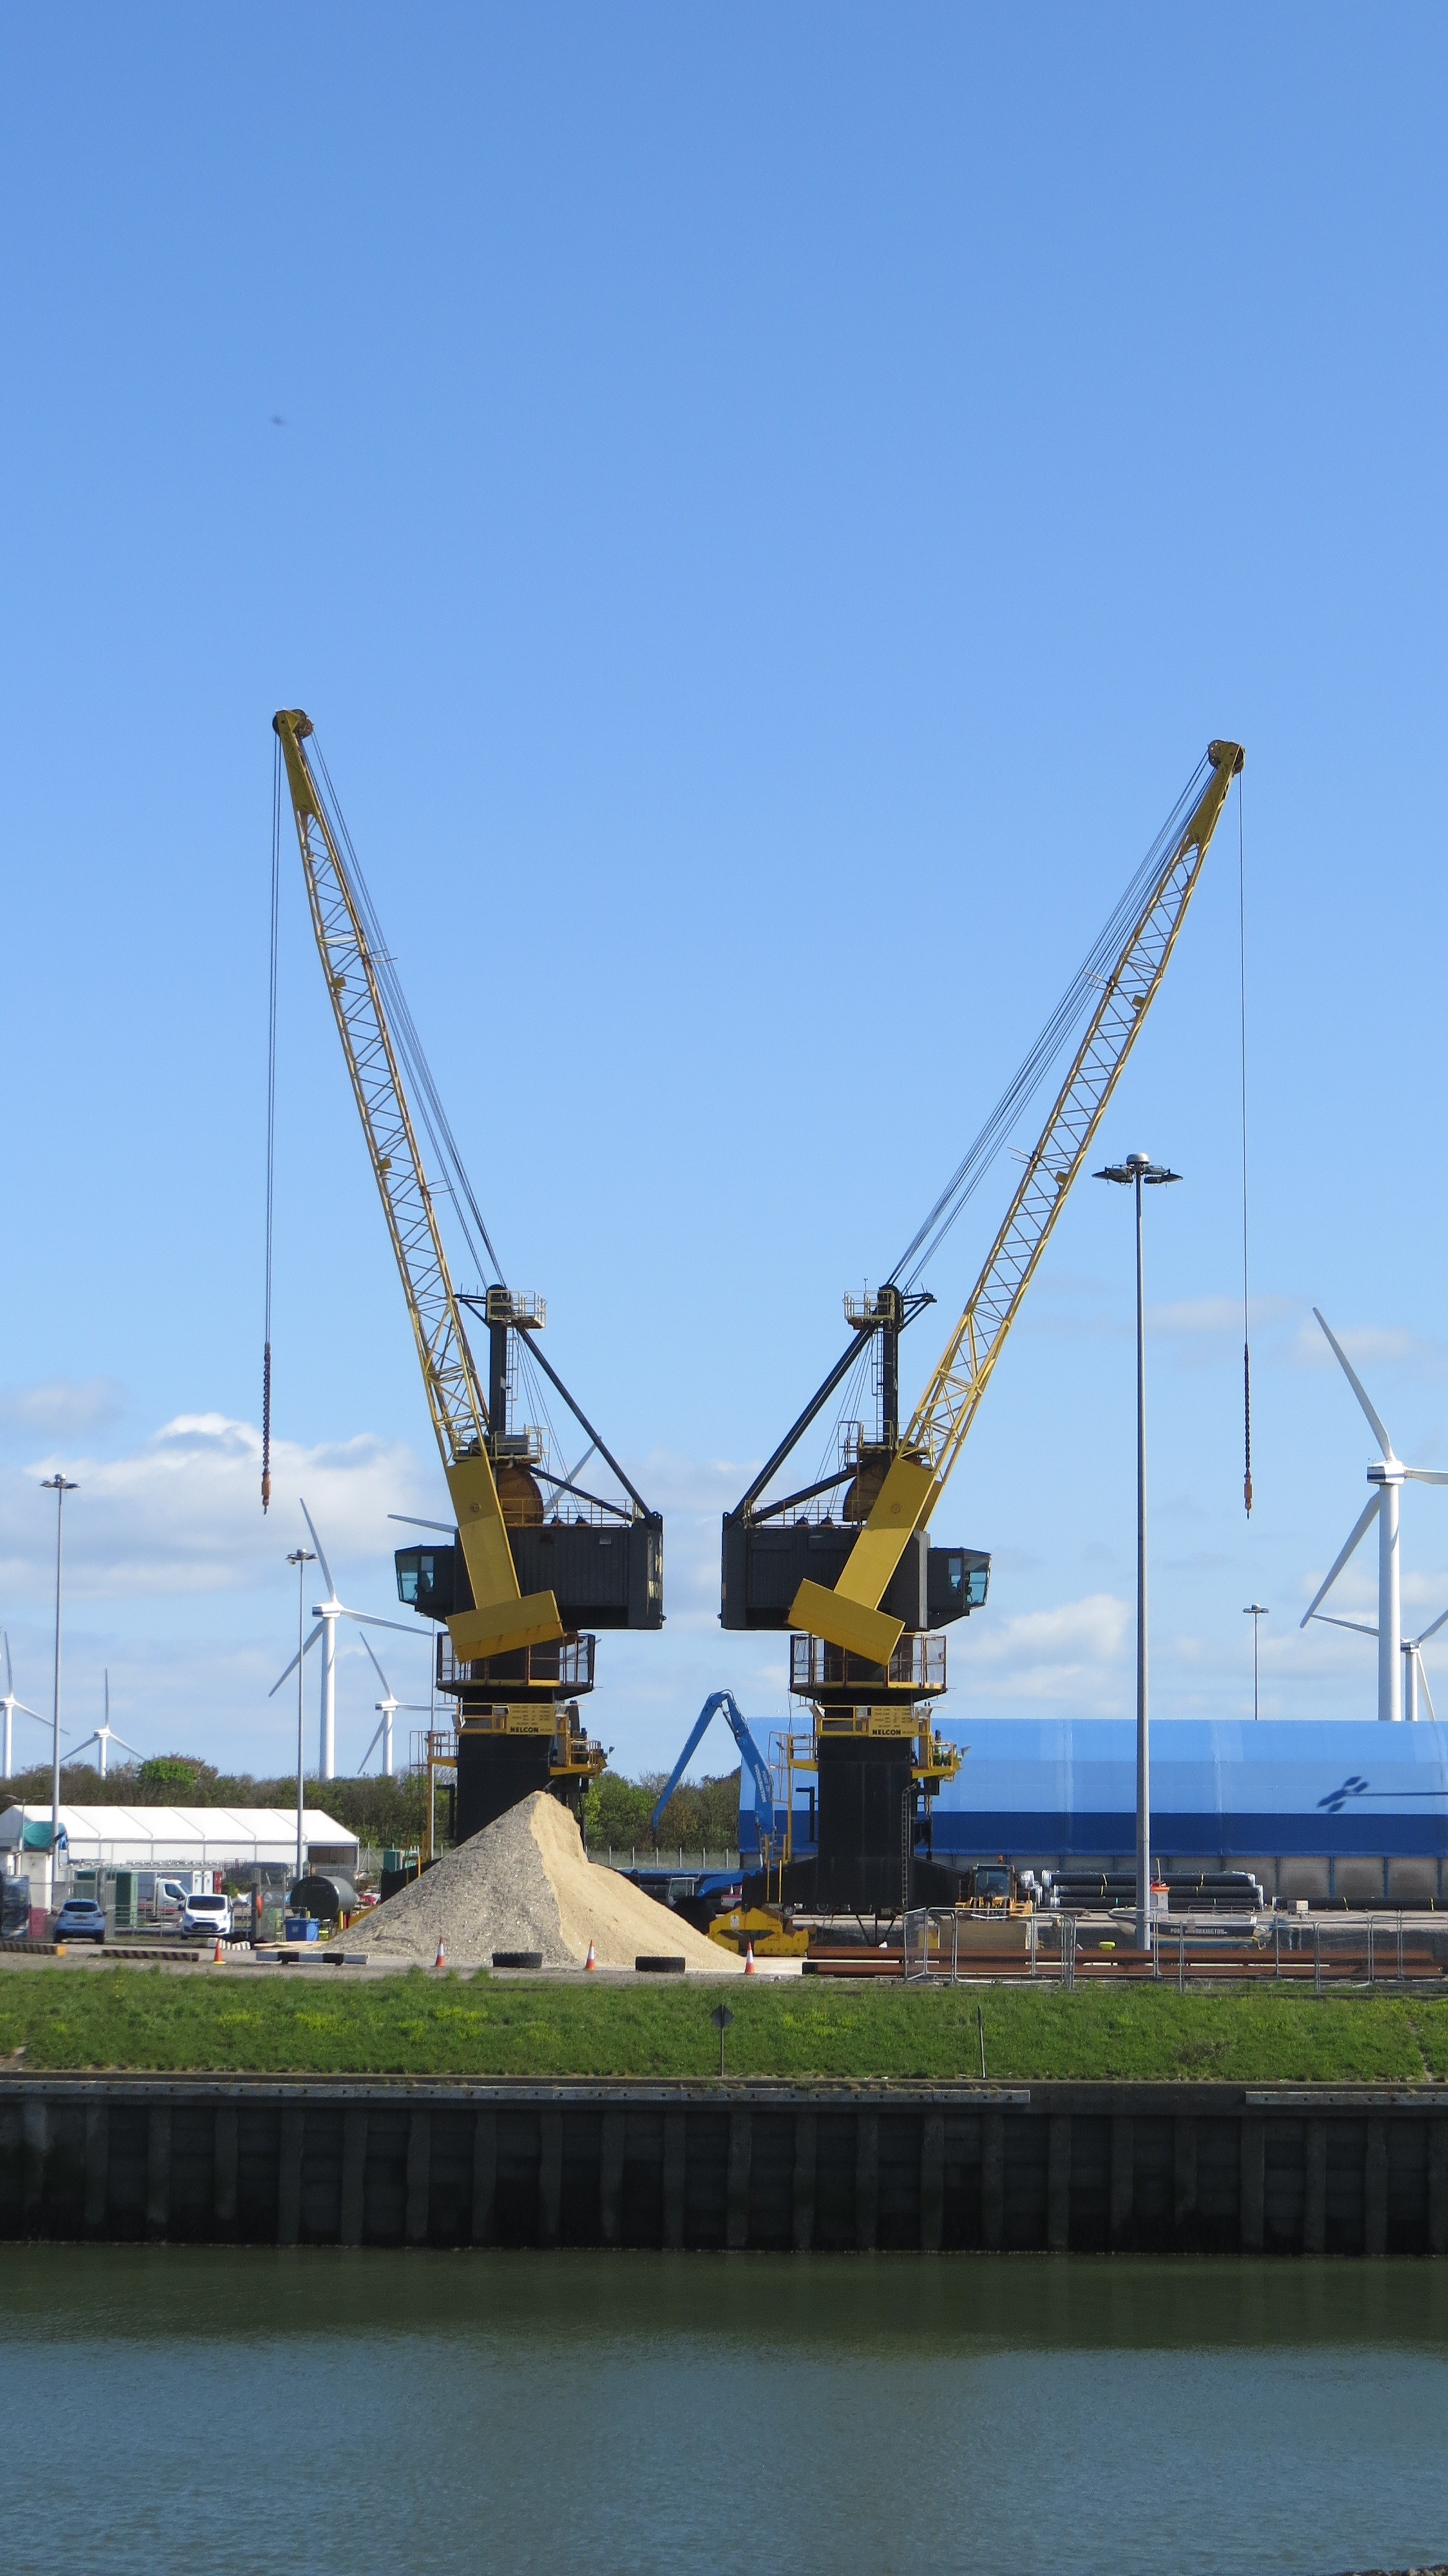 Two Yellow Cranes